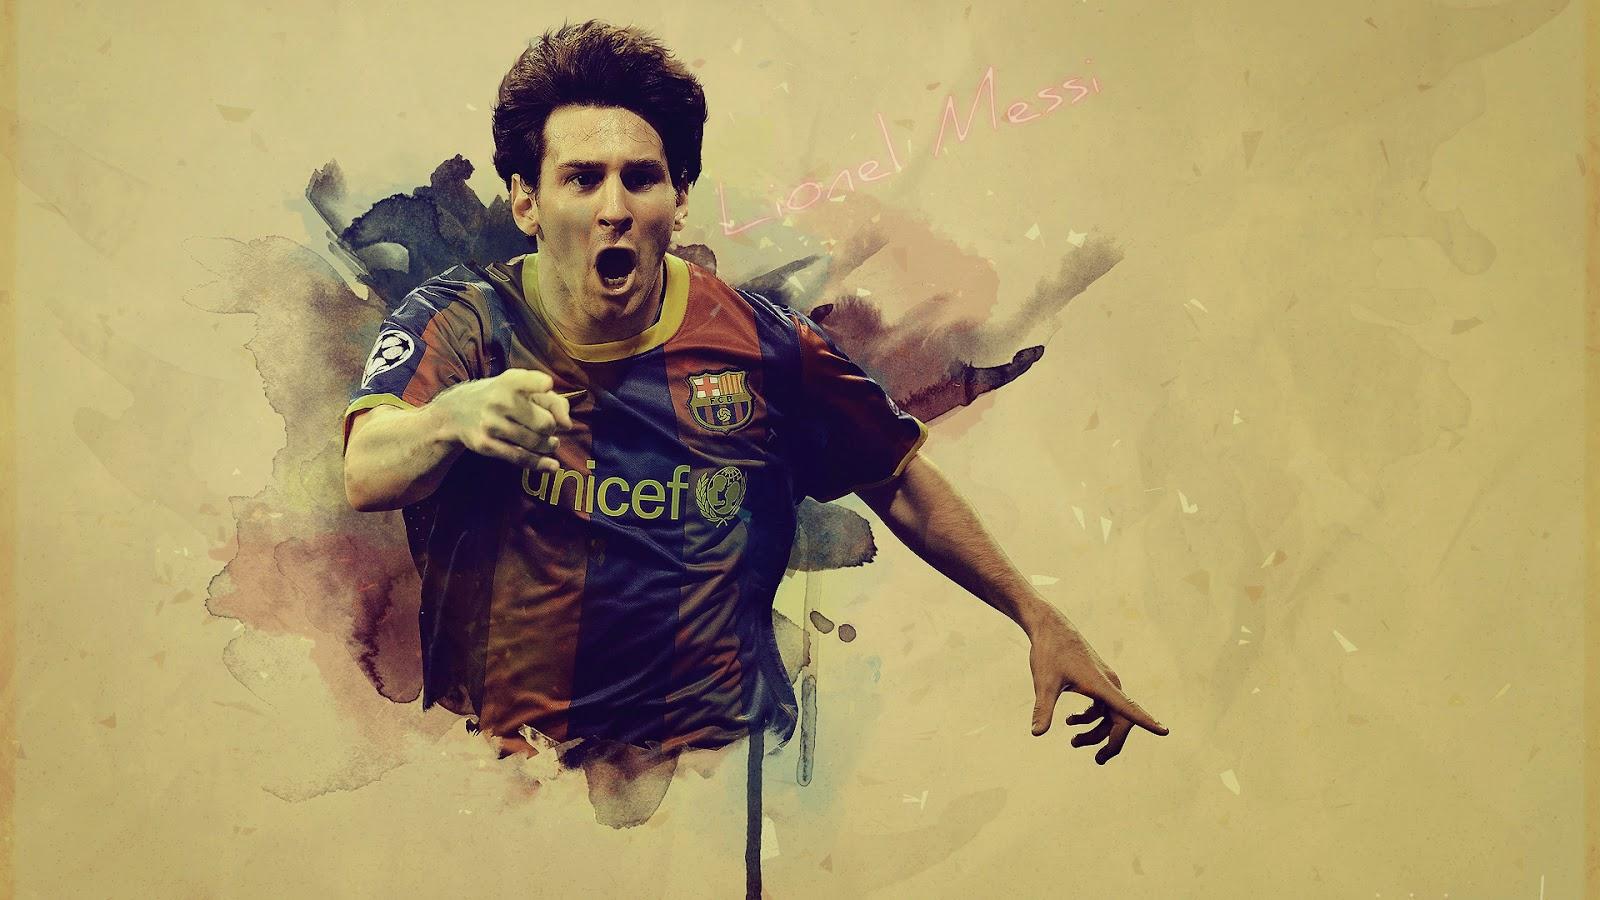 Messi wallpaper 1080p